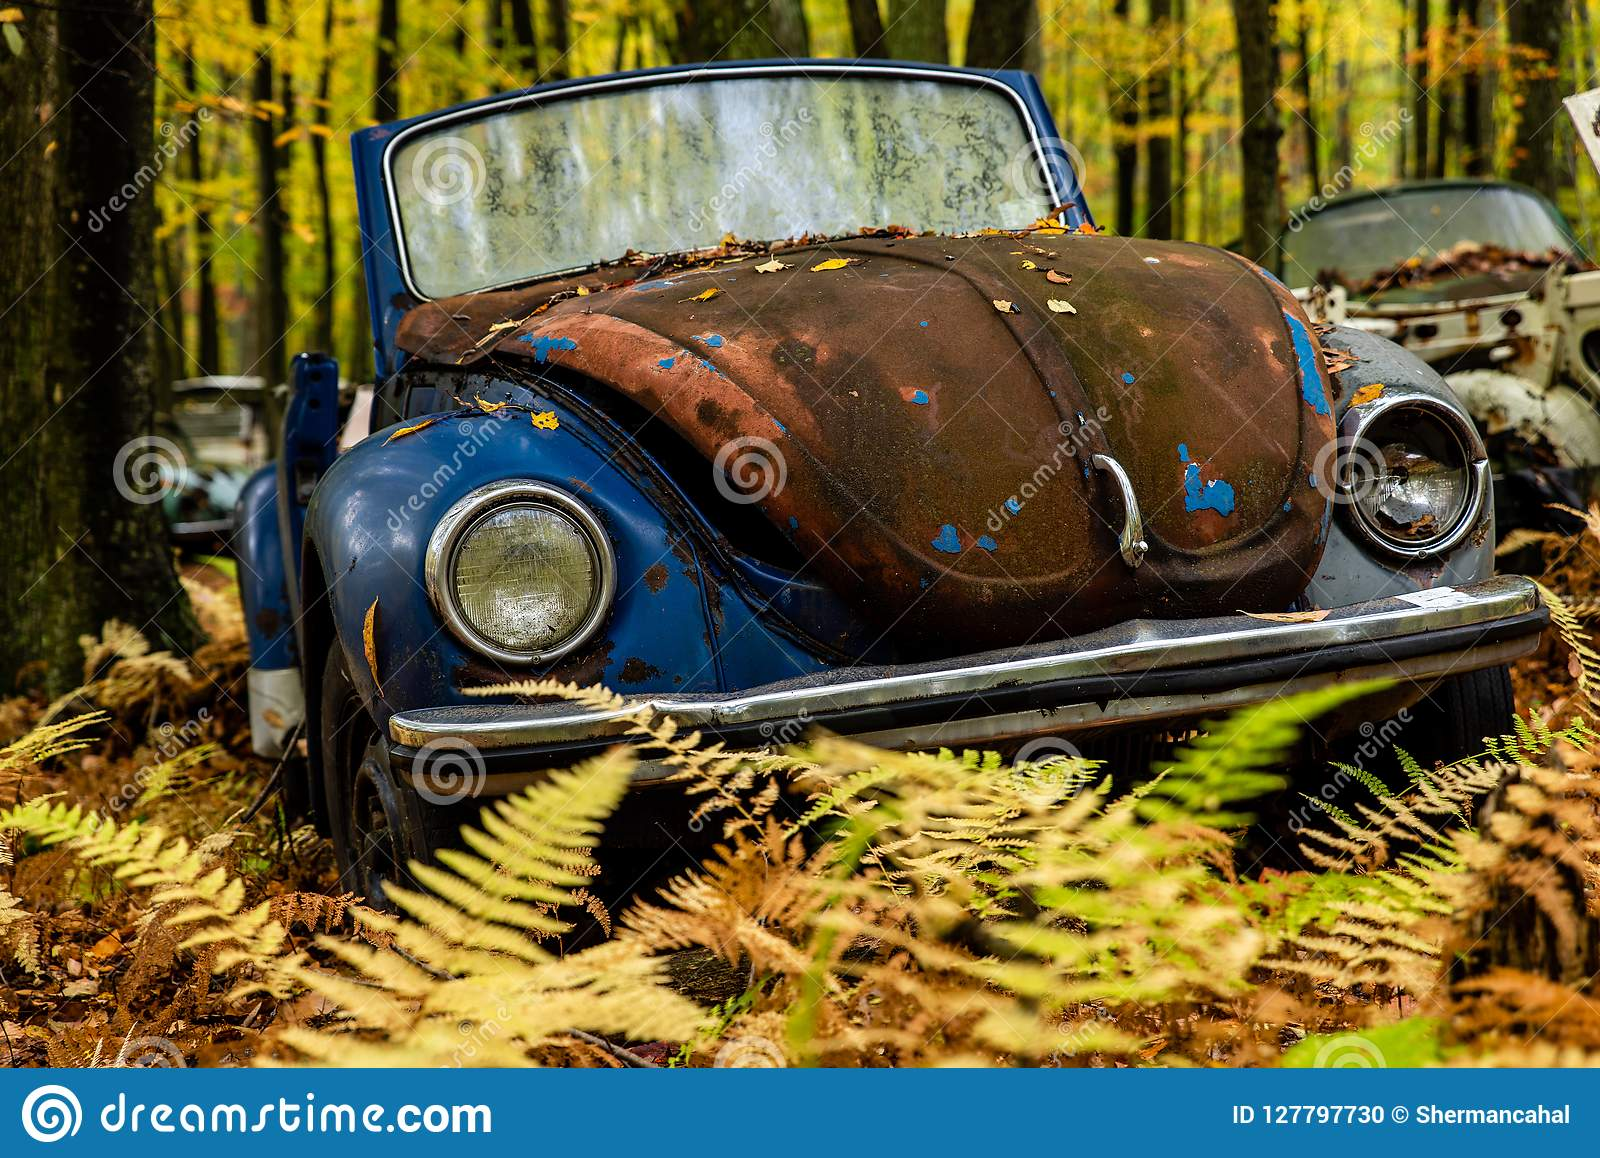 Vintage VW Beetle - Volkswagen Type I - Pennsylvania